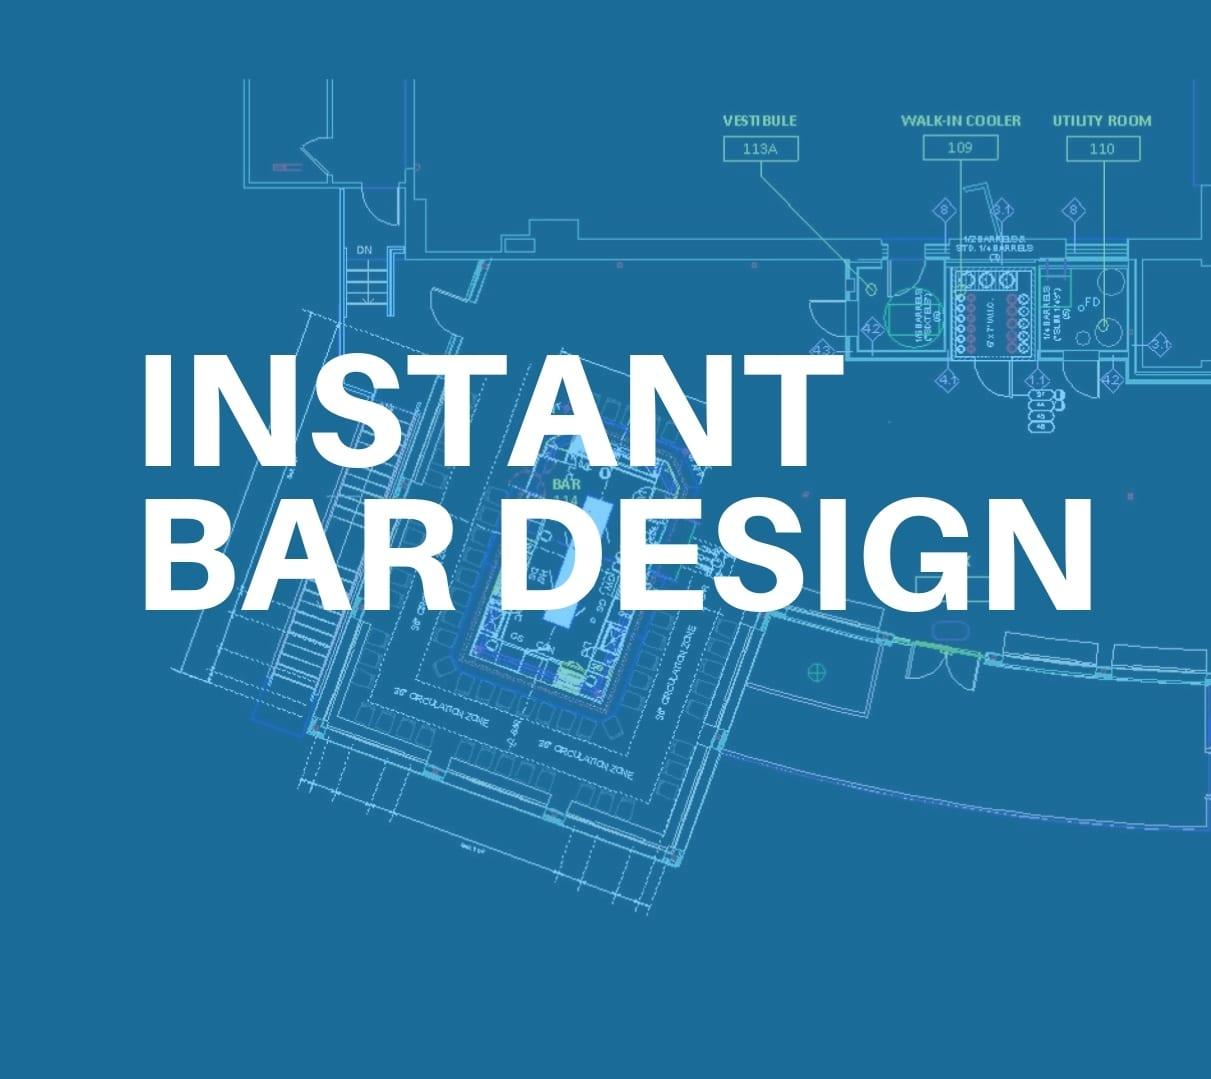 Instant bar design